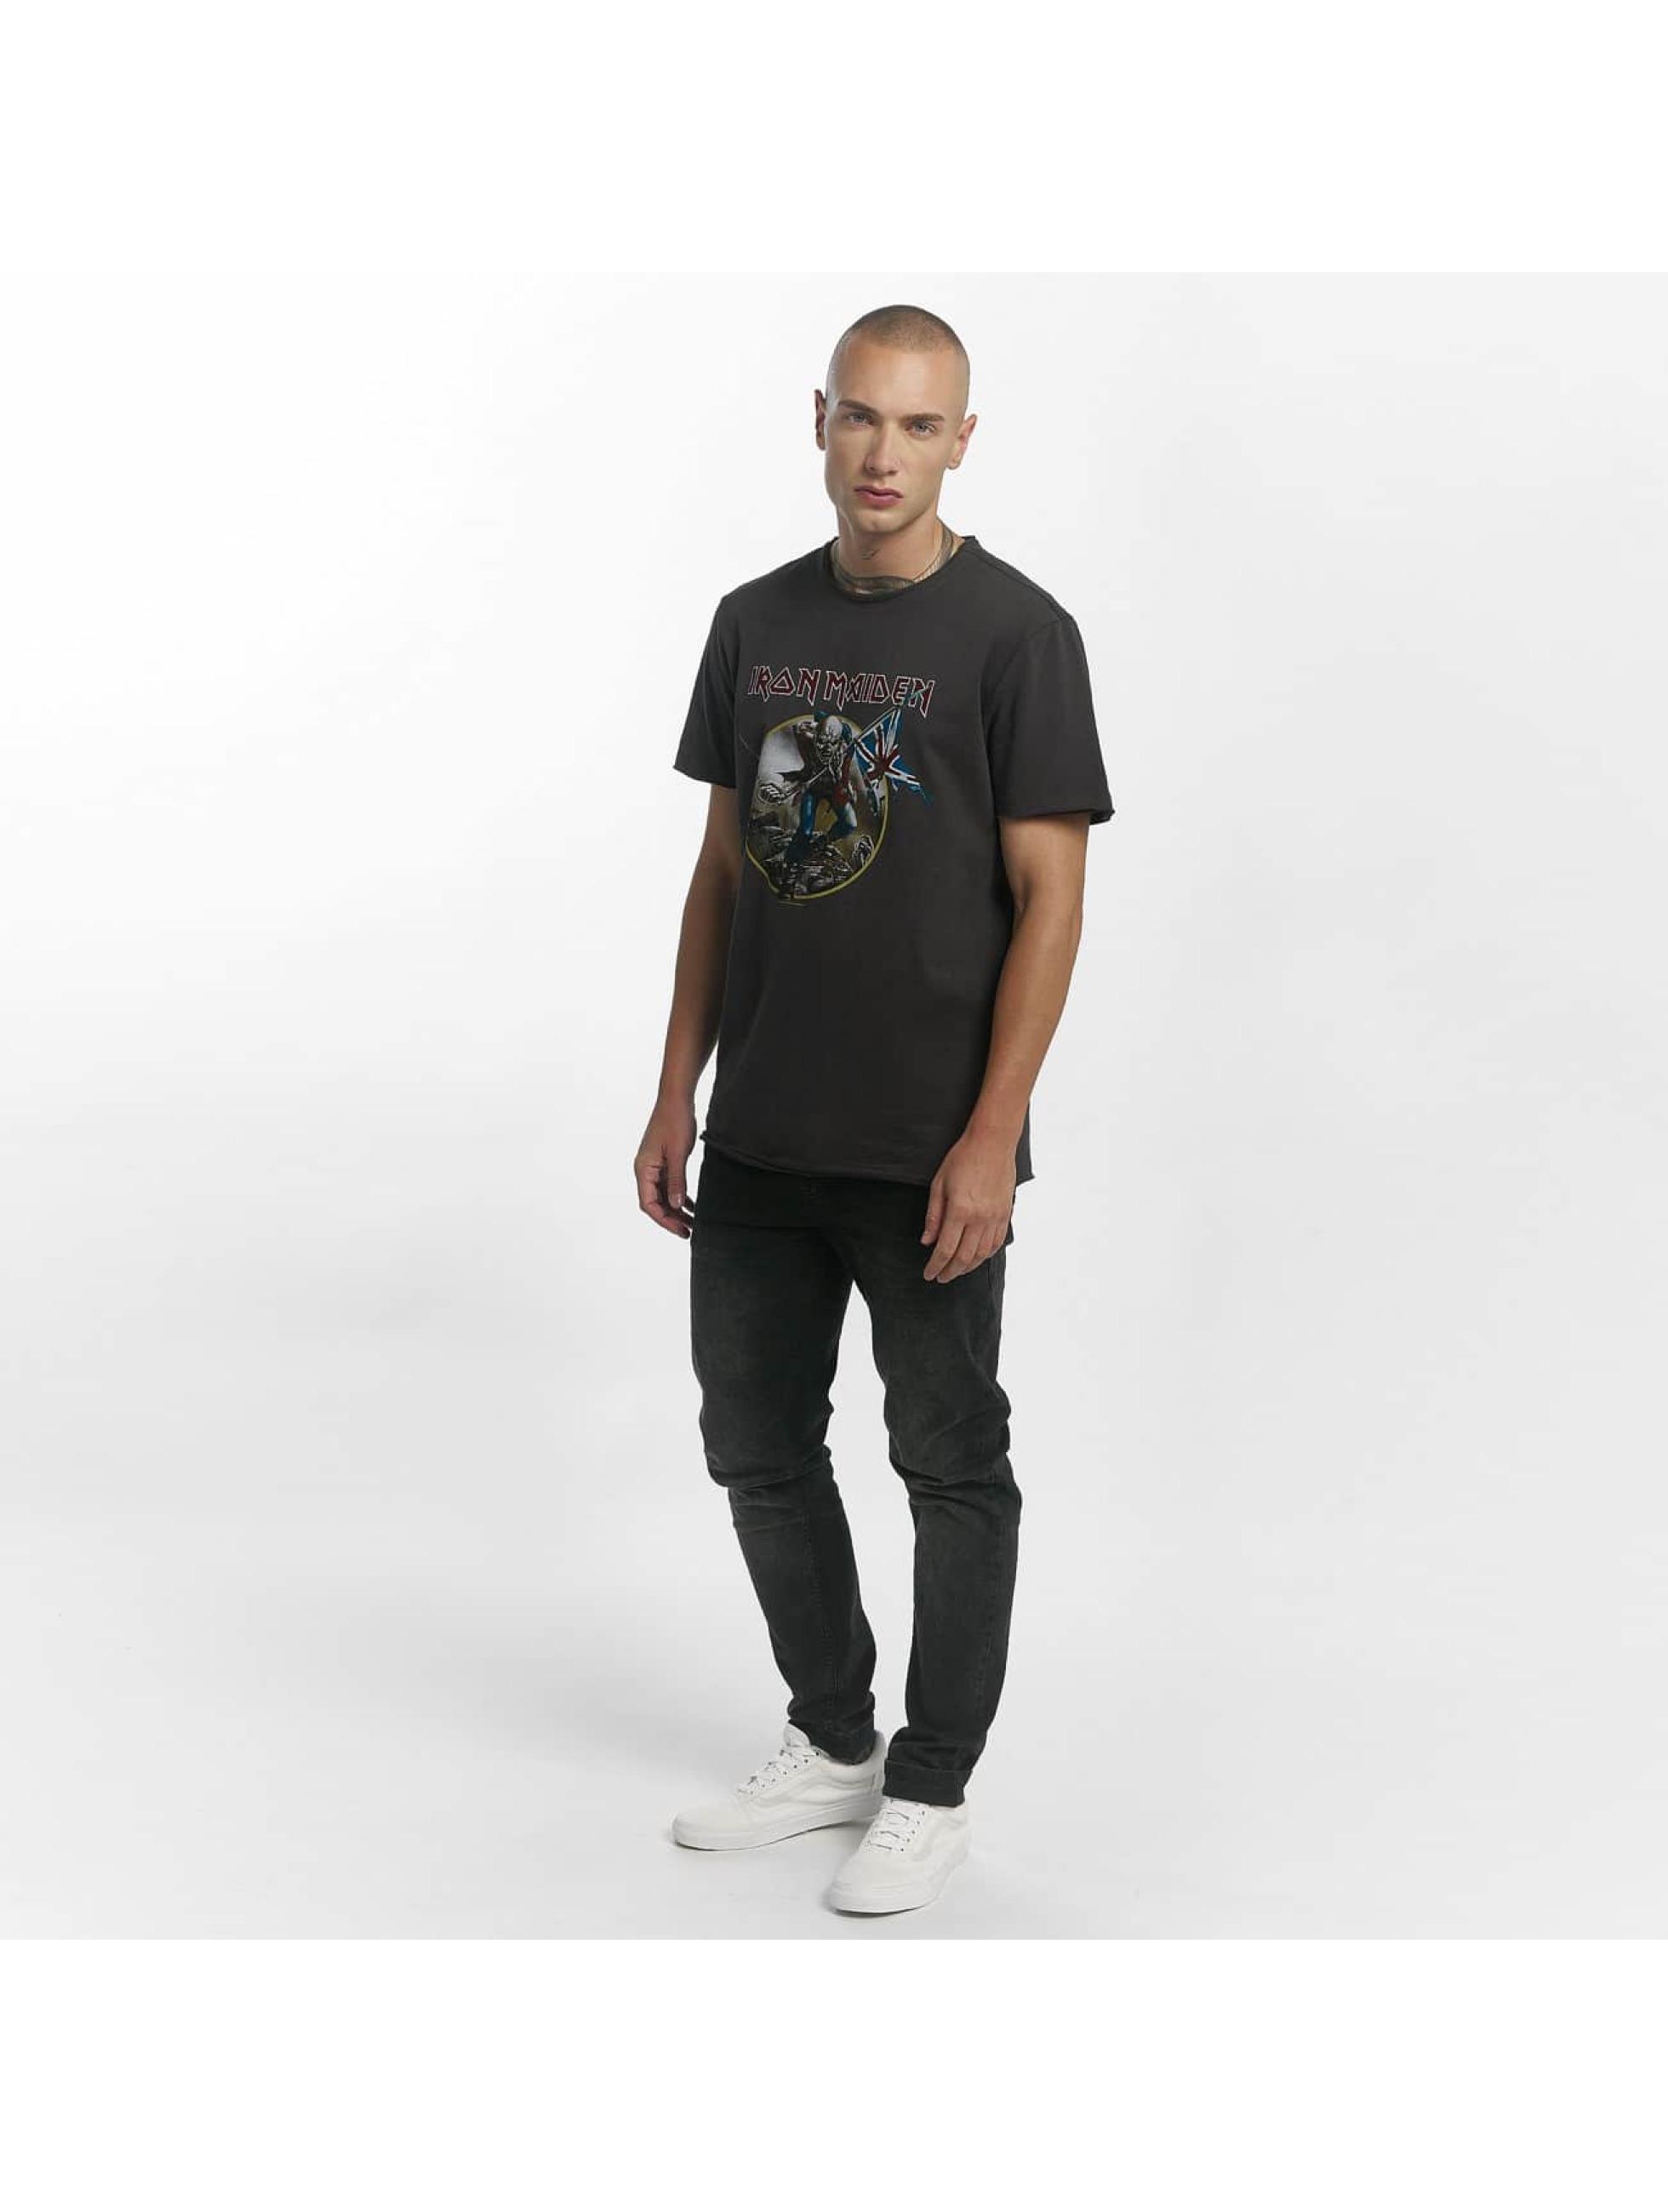 Amplified T-Shirt Iron Maiden Trooper grey